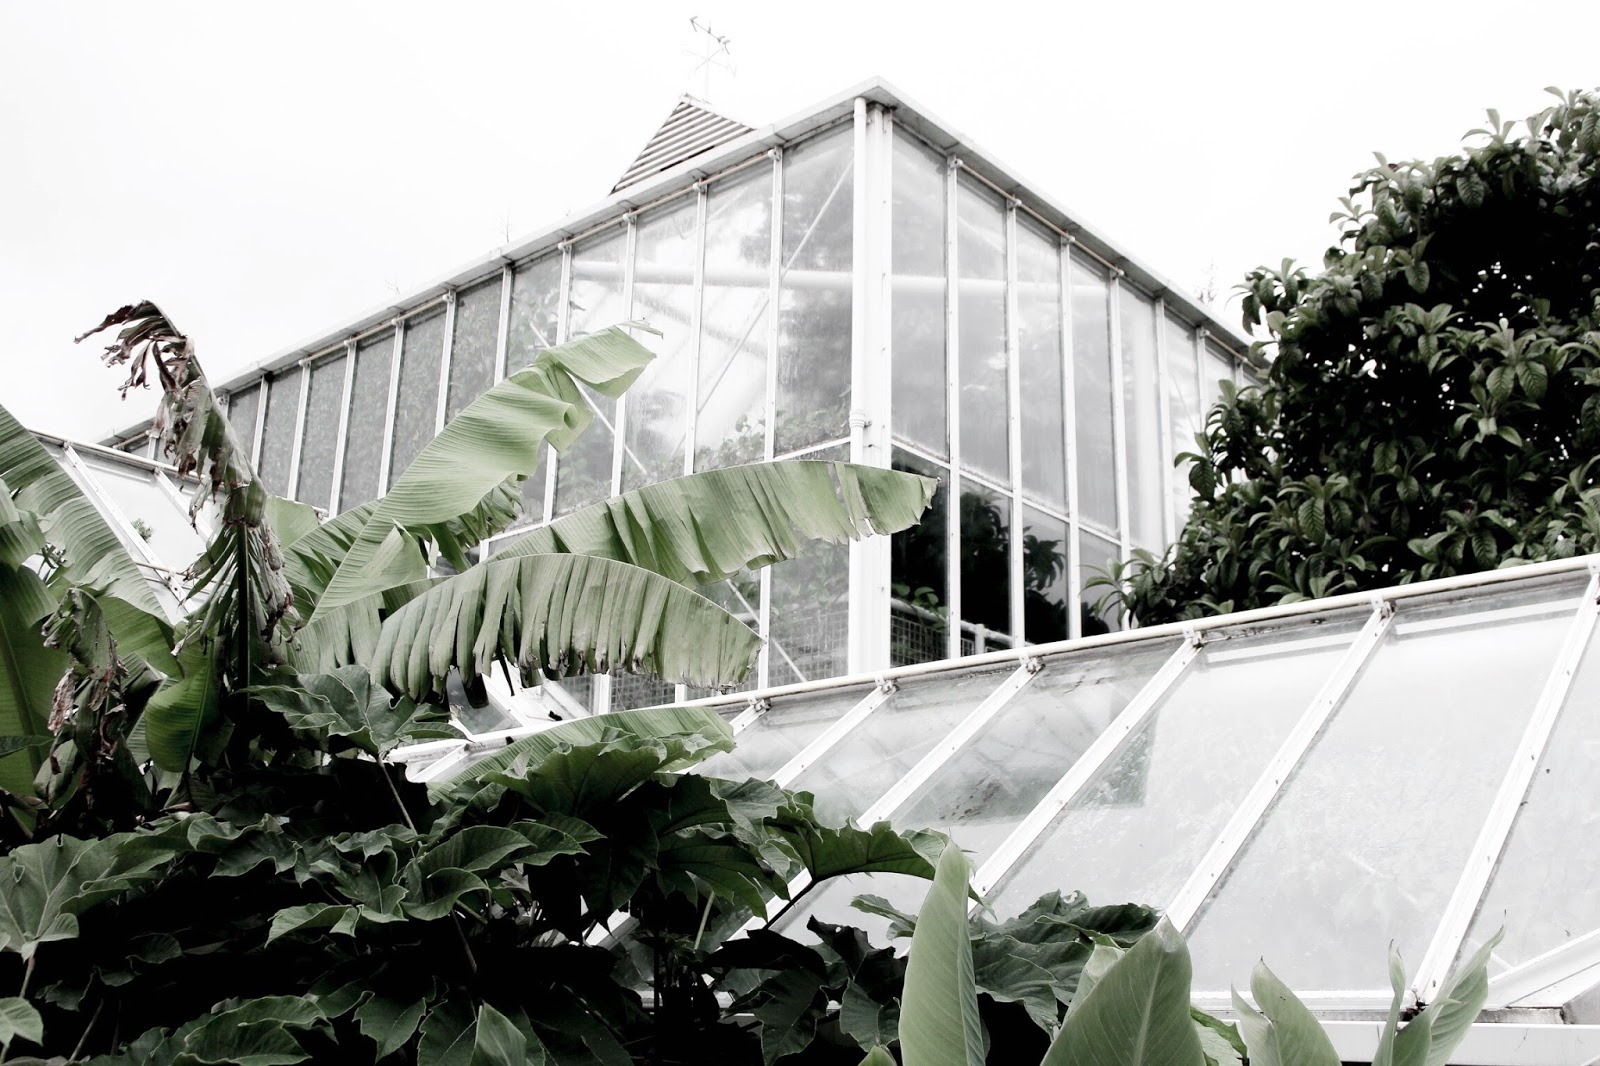 Travel Blog List of the Best Glasshouses in the UK